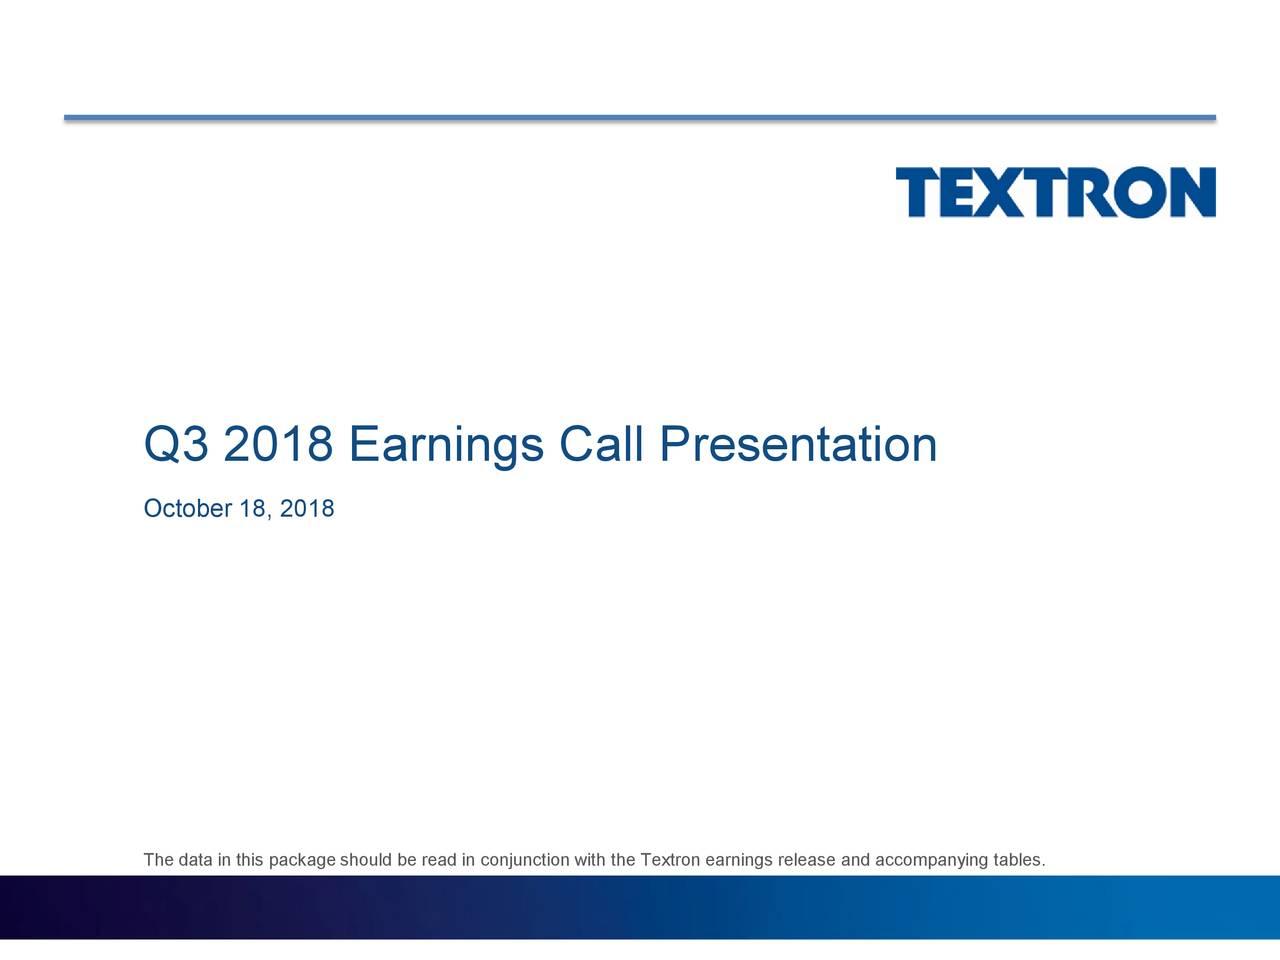 Q3 2018 Earnings Call Presentation